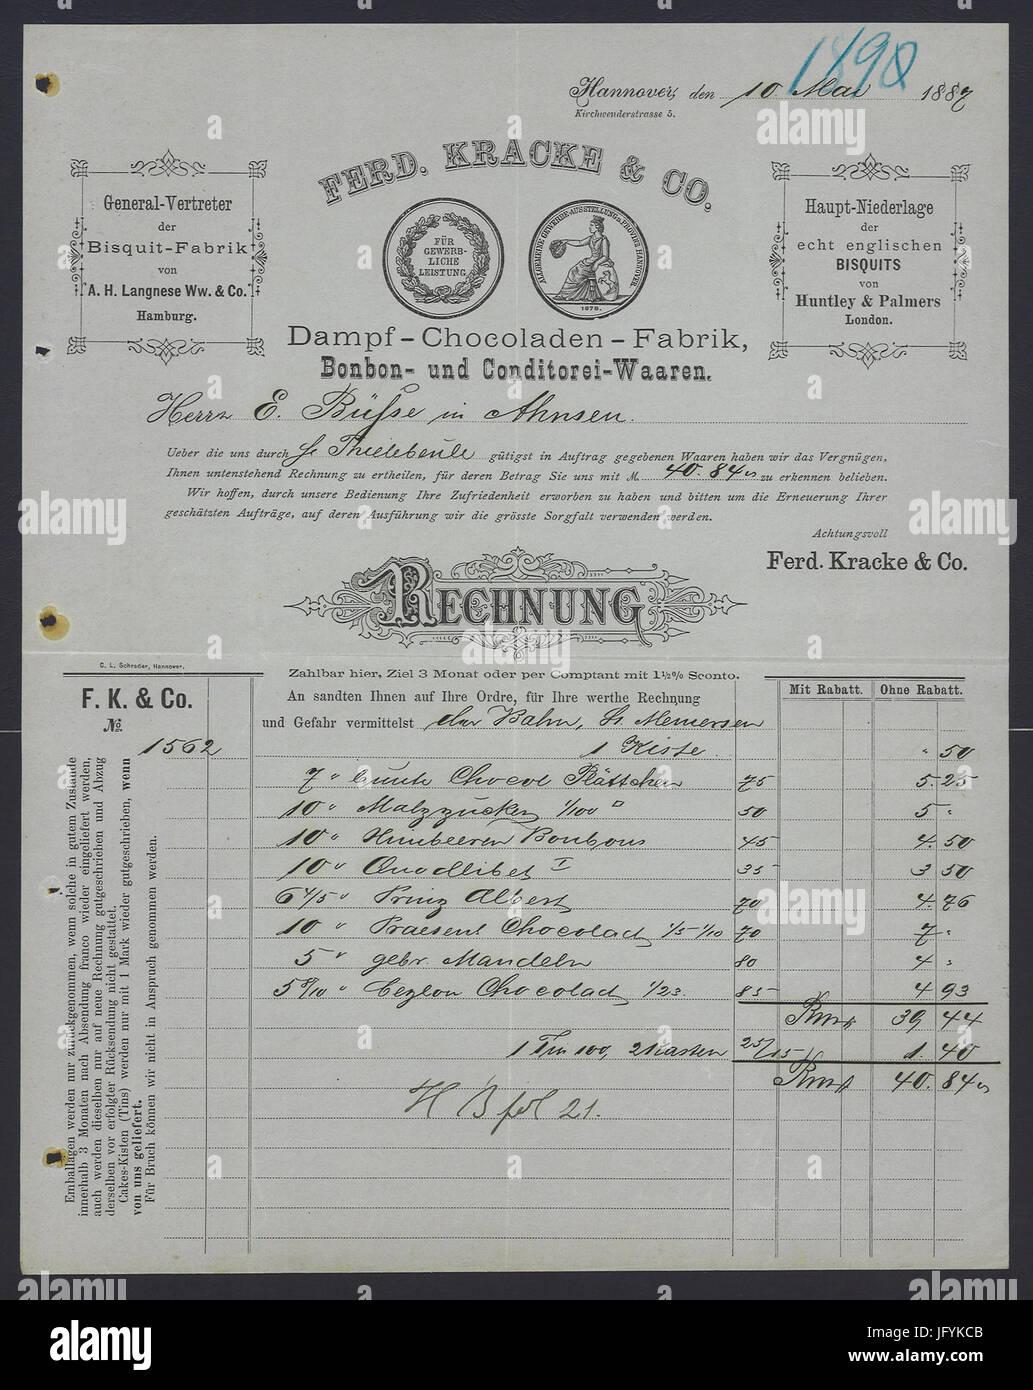 Ferdinand Kracke & Co. Hannover 1887-05-10 Rechnung Stock Photo ...